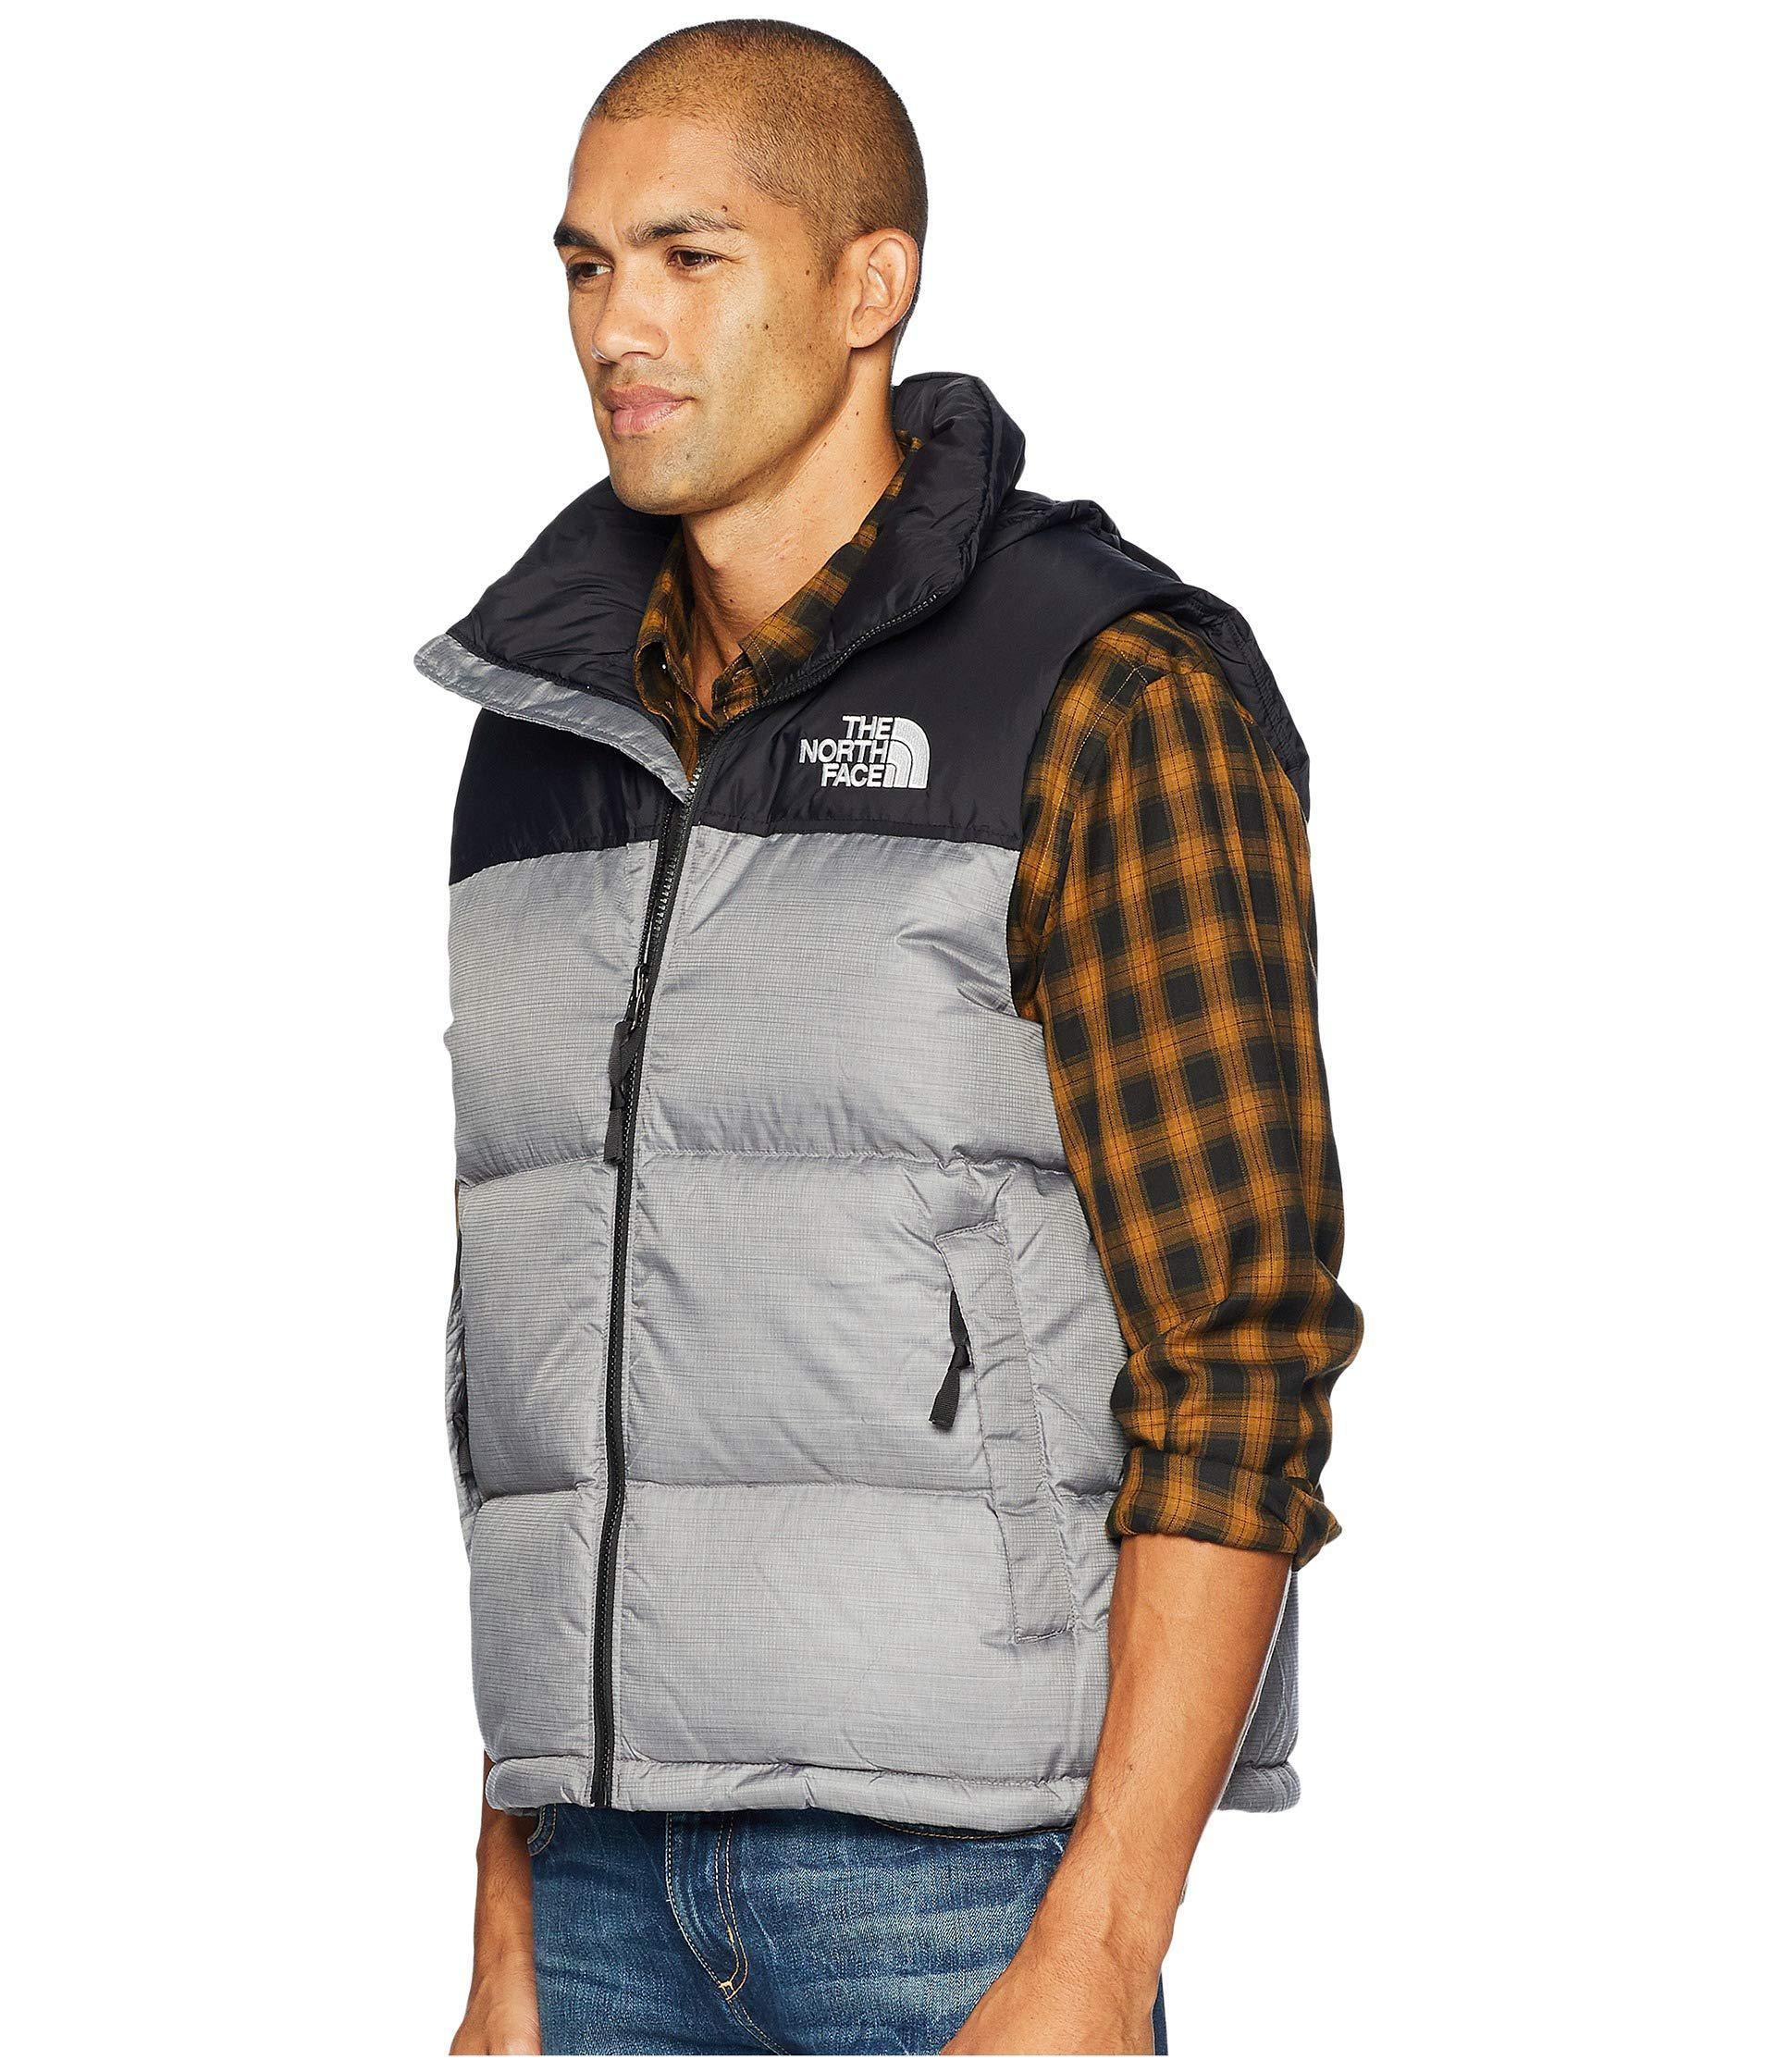 605358e226 Lyst - The North Face 1996 Retro Nuptse Vest (aztec Blue) Men s Vest in  Gray for Men